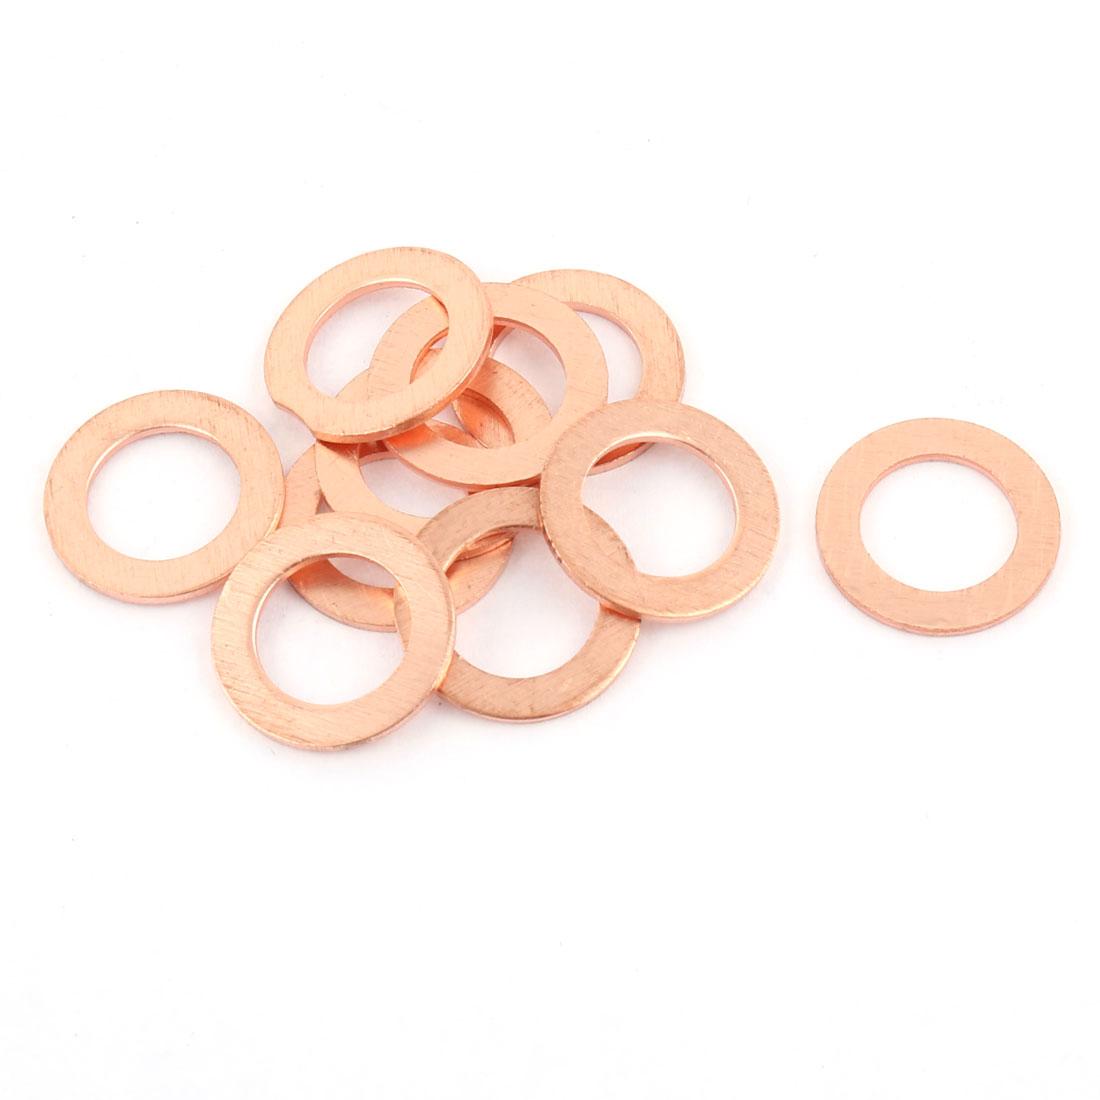 10pcs 10mm x 16mm x 1mm Flat Ring Copper Crush Washer Sealing Gasket Fastener